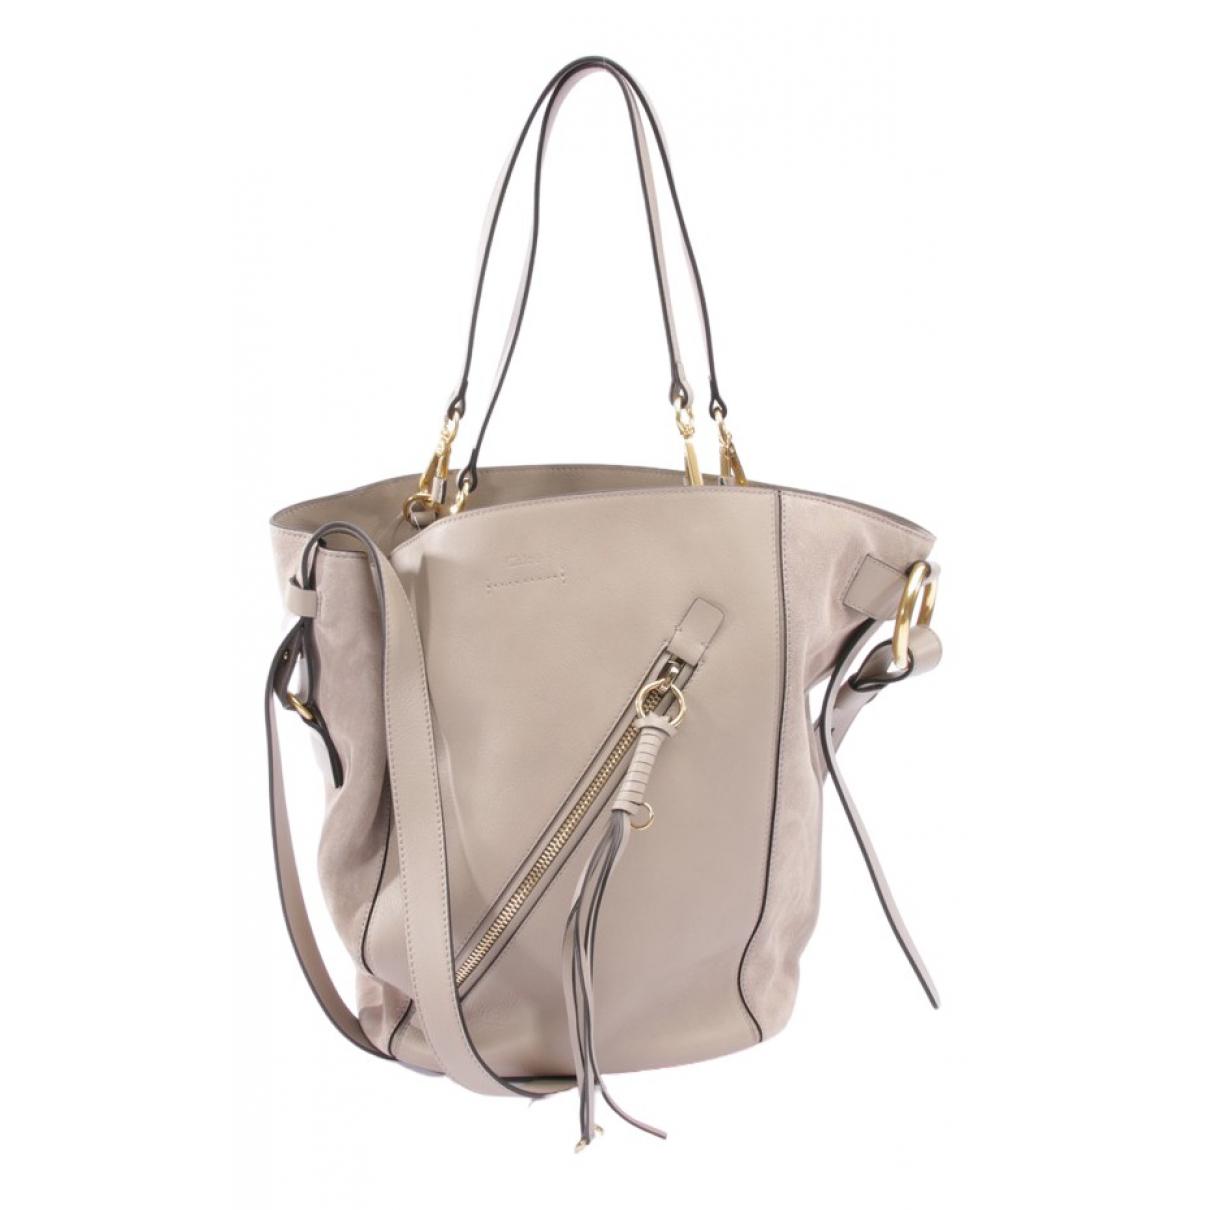 Chloé \N Beige Leather handbag for Women \N